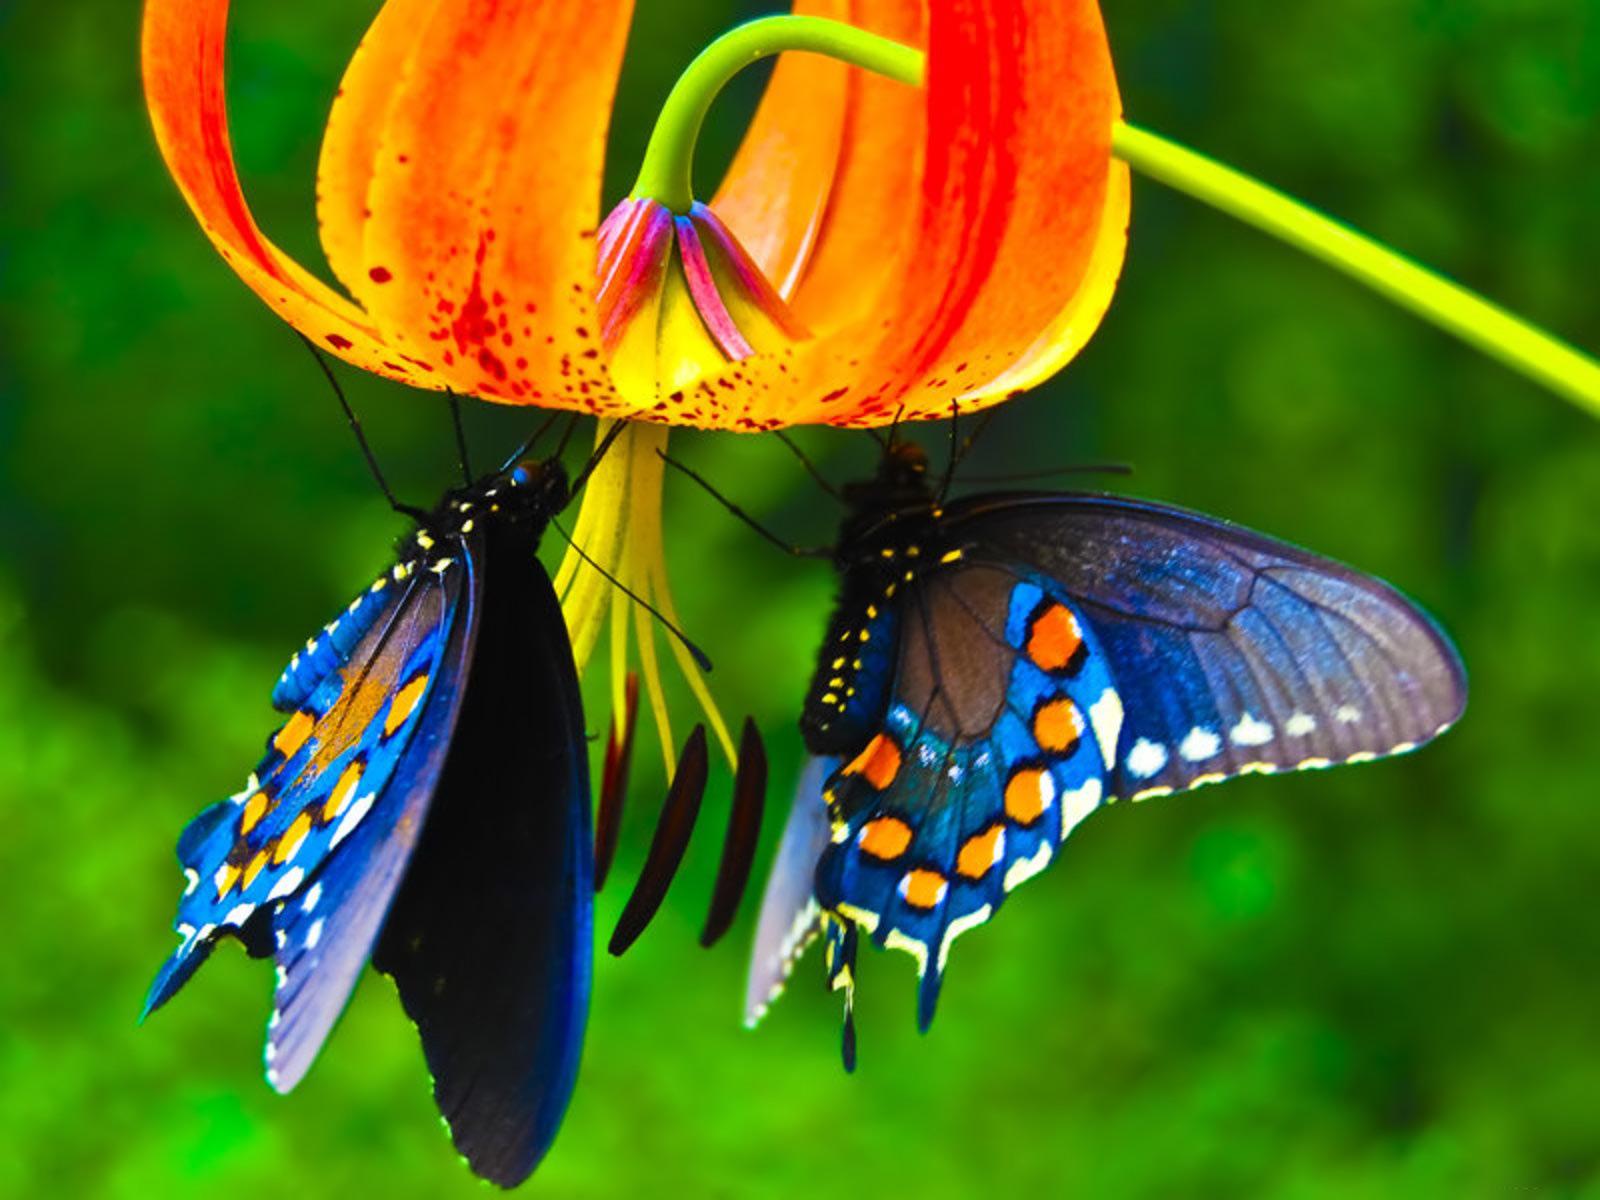 http://2.bp.blogspot.com/-IzoTS7ZqeEw/Tt8i8Ao9BxI/AAAAAAAAAk0/j8D4ge46l64/s1600/King_Priamos_butterfly_images.jpg